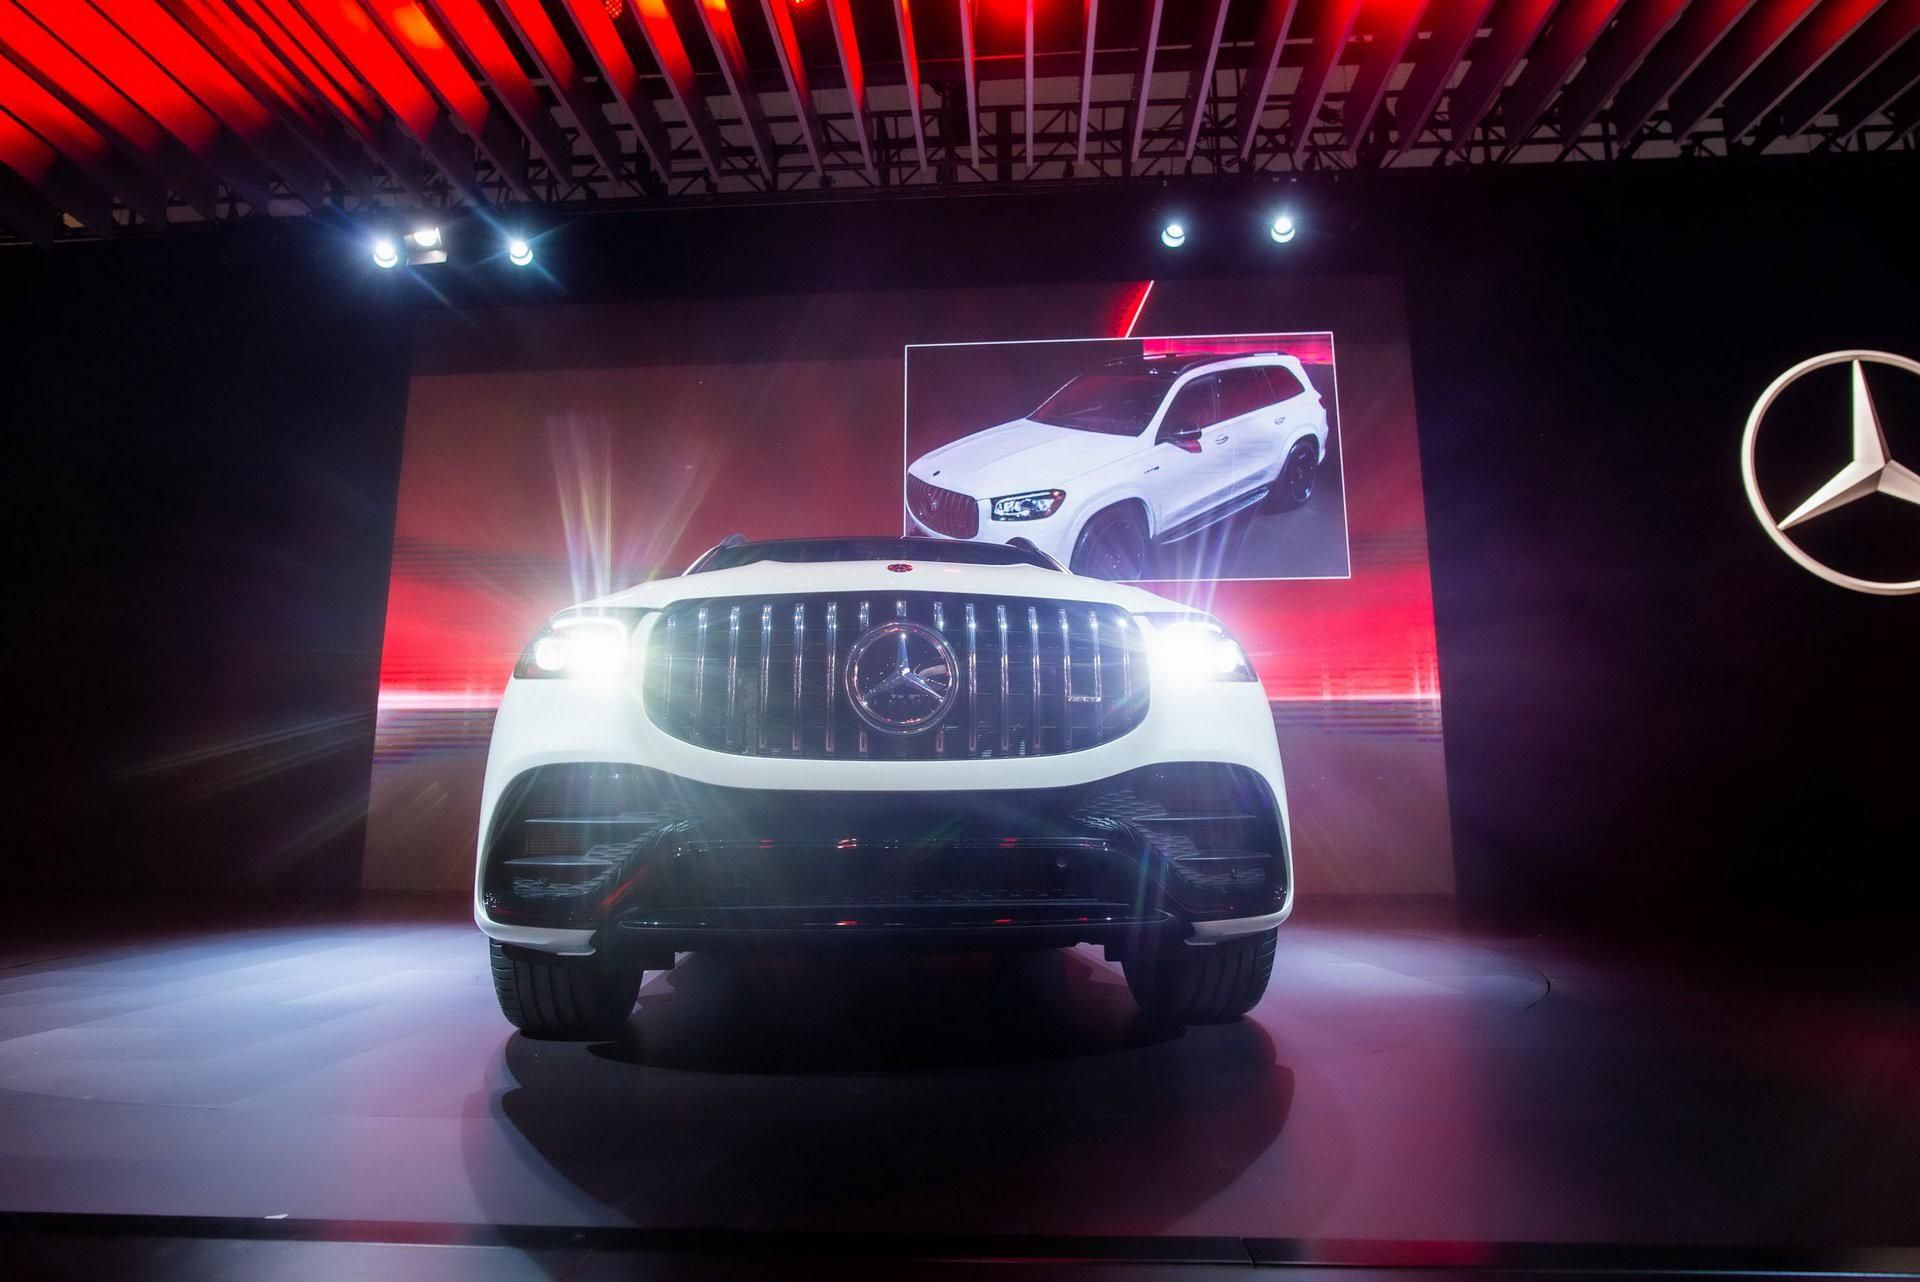 Khám phá Mercedes GLS 63 2020 vừa ra mắt Ảnh 9